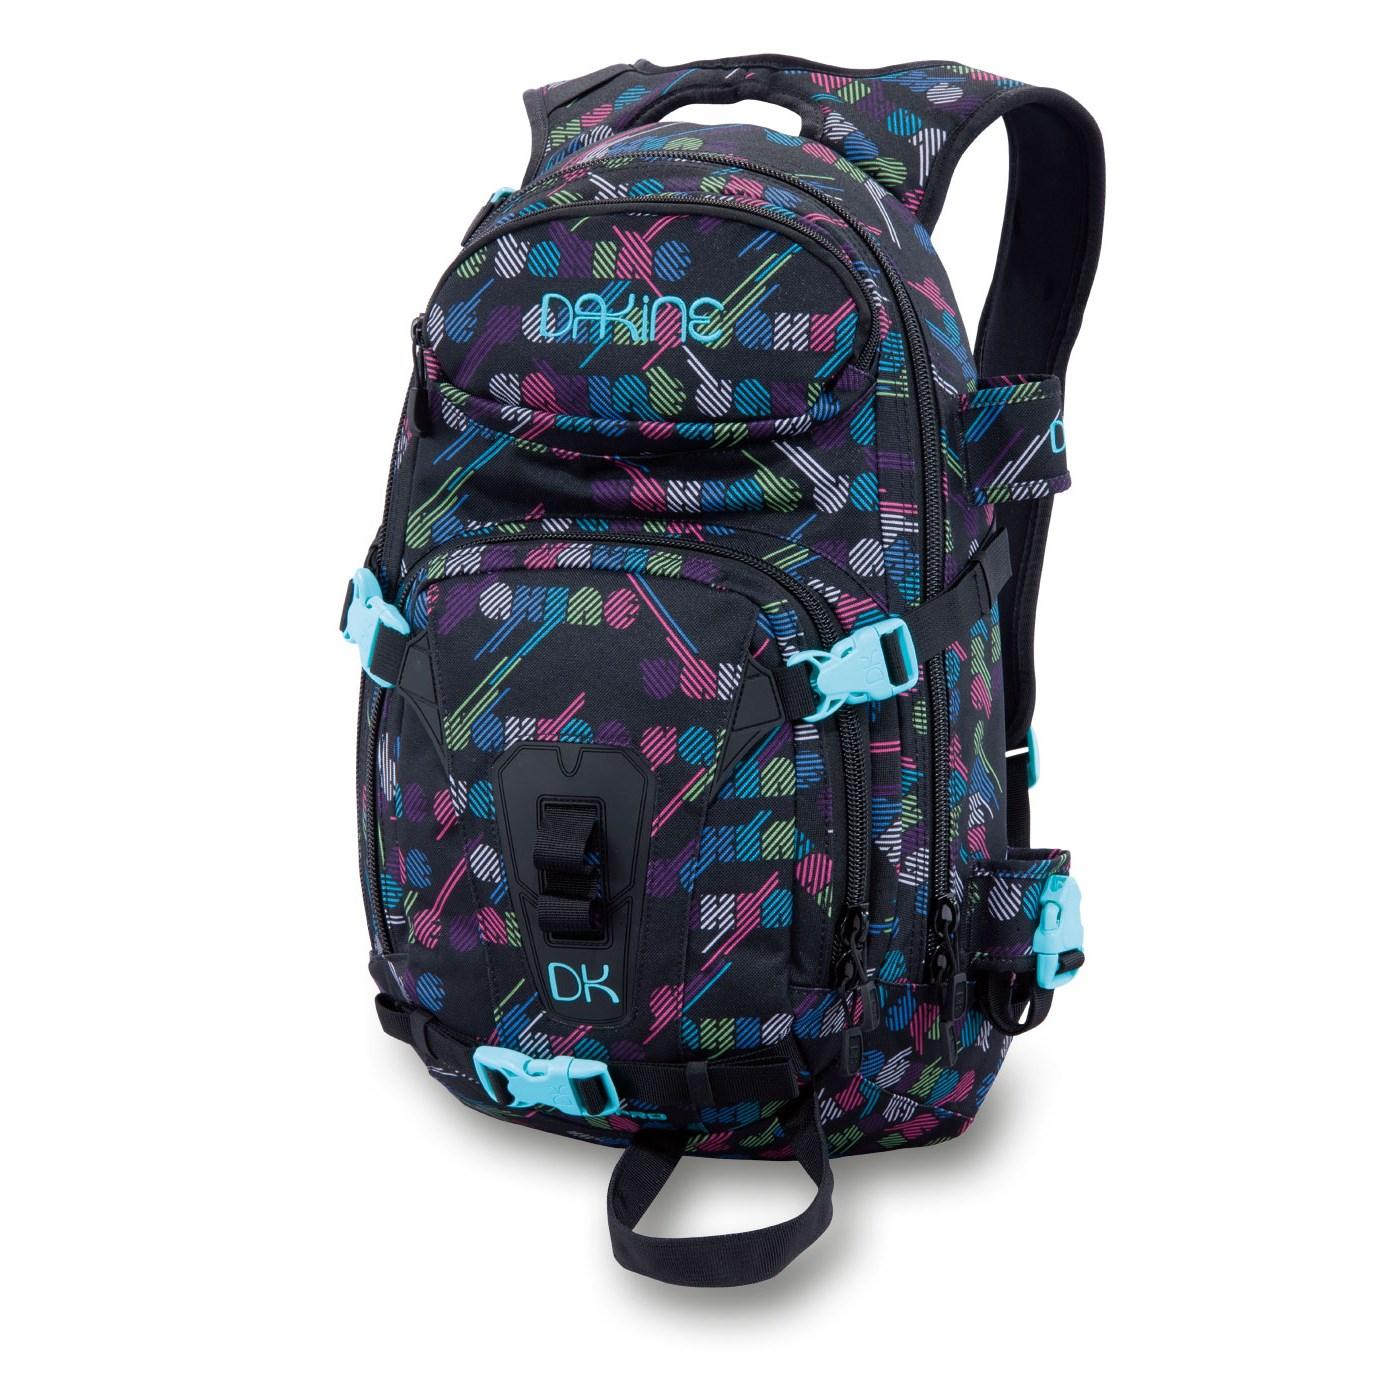 DaKine Girls Heli Pro 18L Backpack | evo outlet